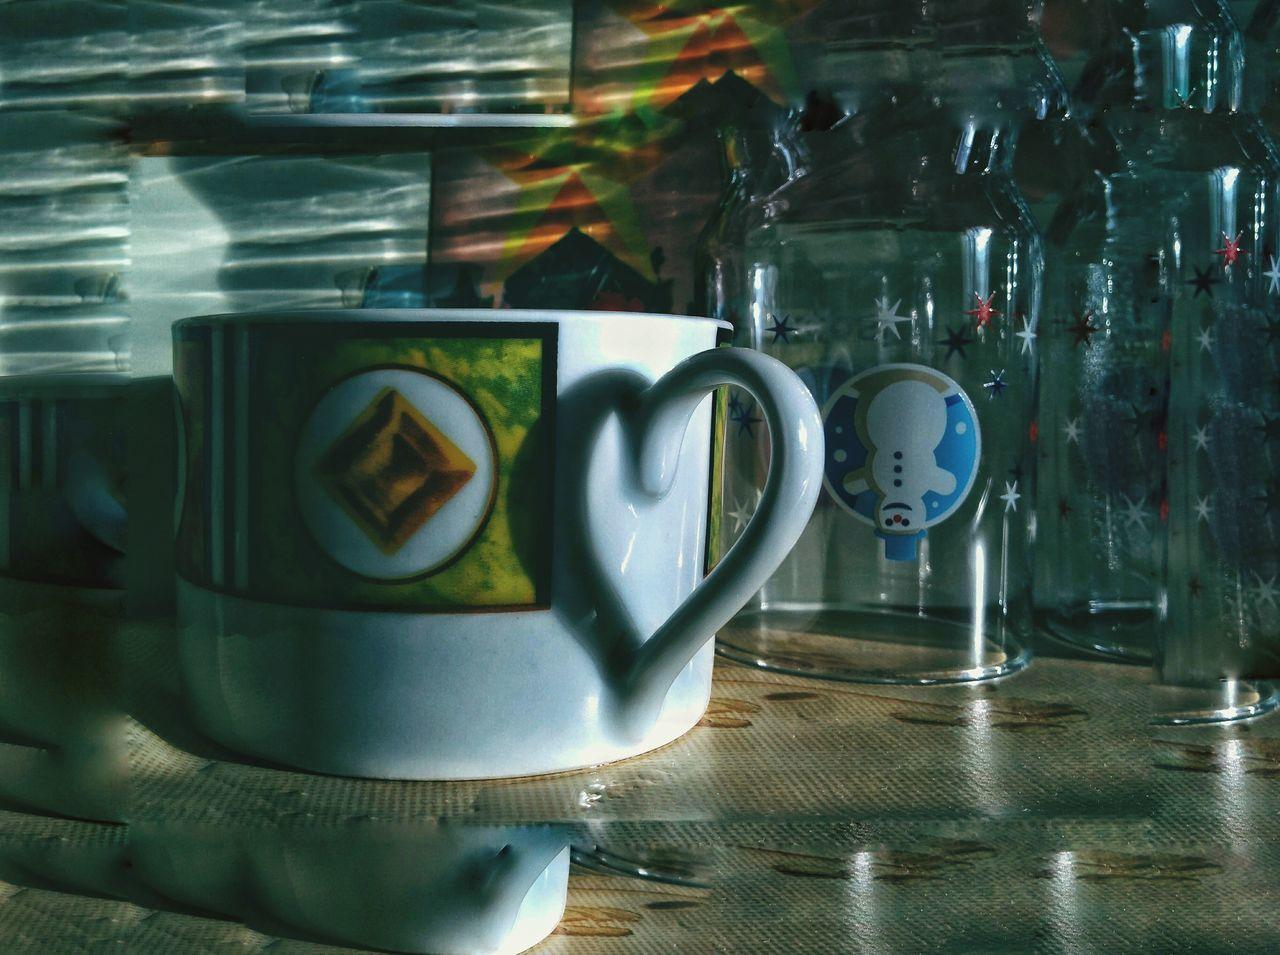 Heart Cup Cup Of Coffee Love Coffee Coffee Cup Heart Heart Shape Shadow